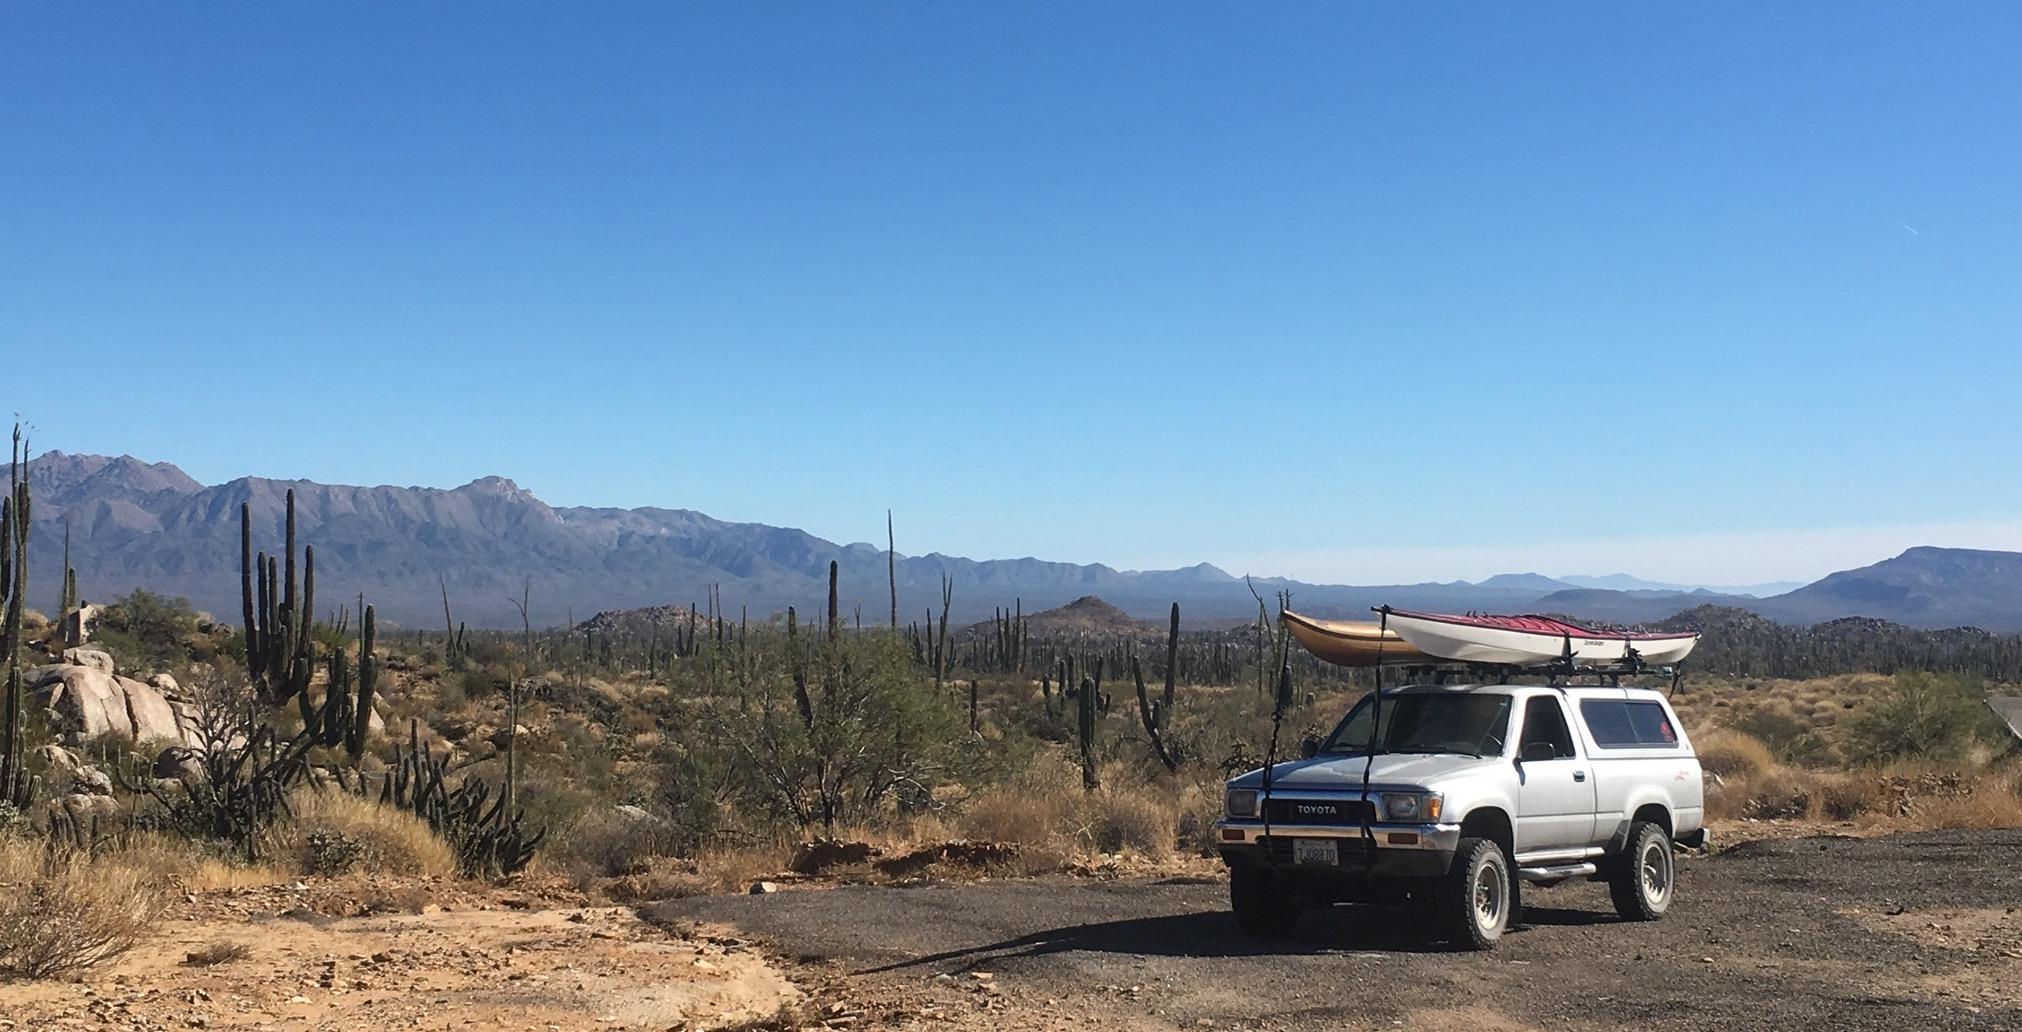 Finally across the border! Baja is the best!